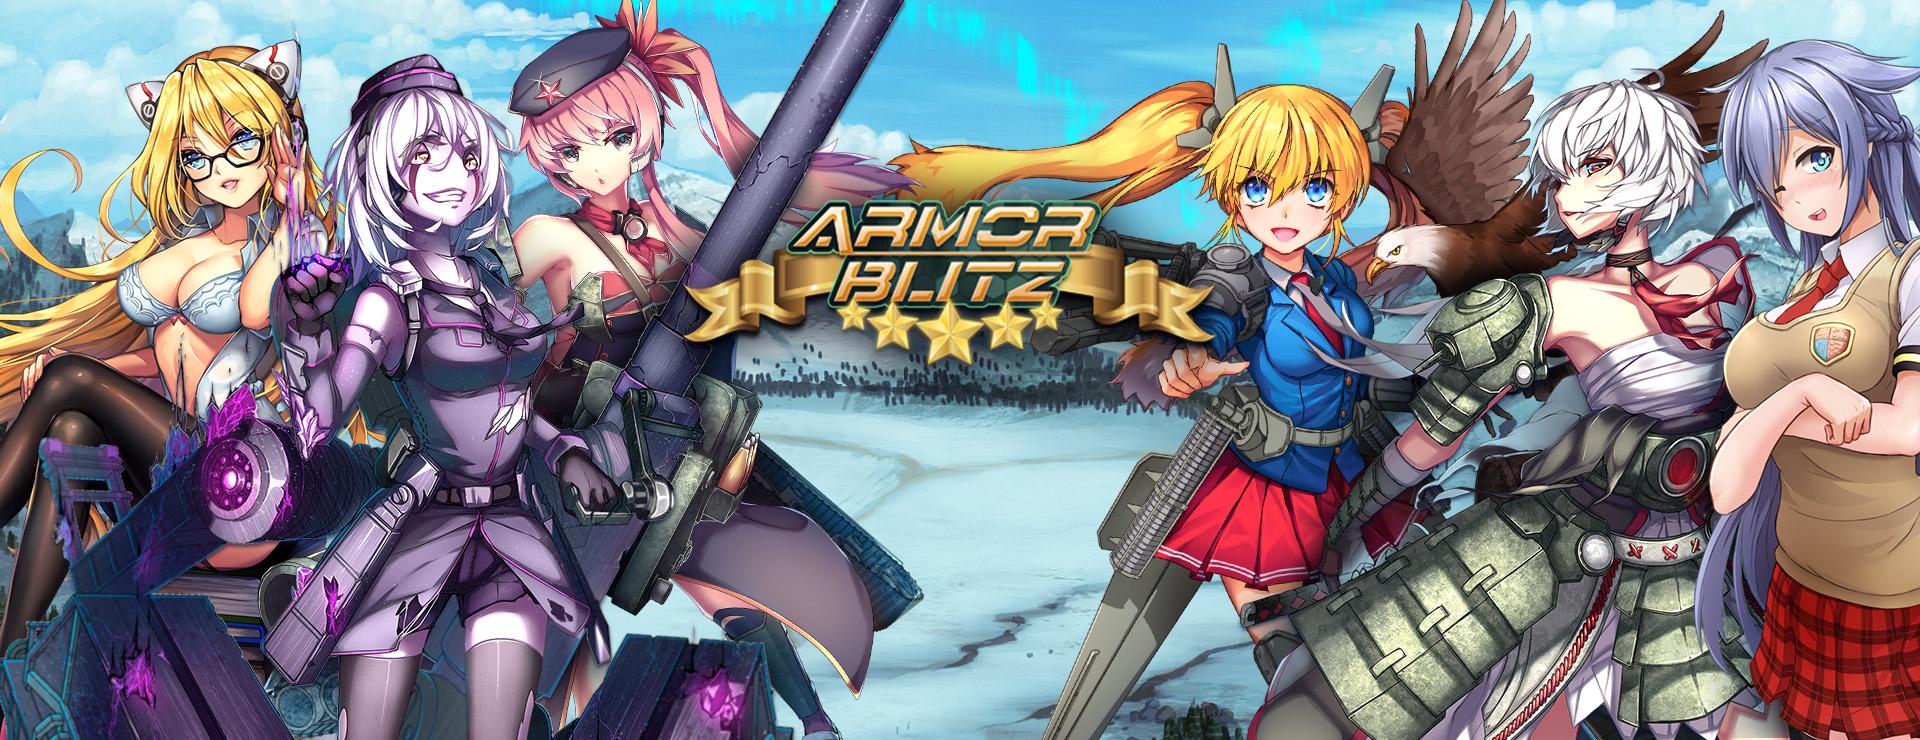 Armor Blitz Online - Strategy Game